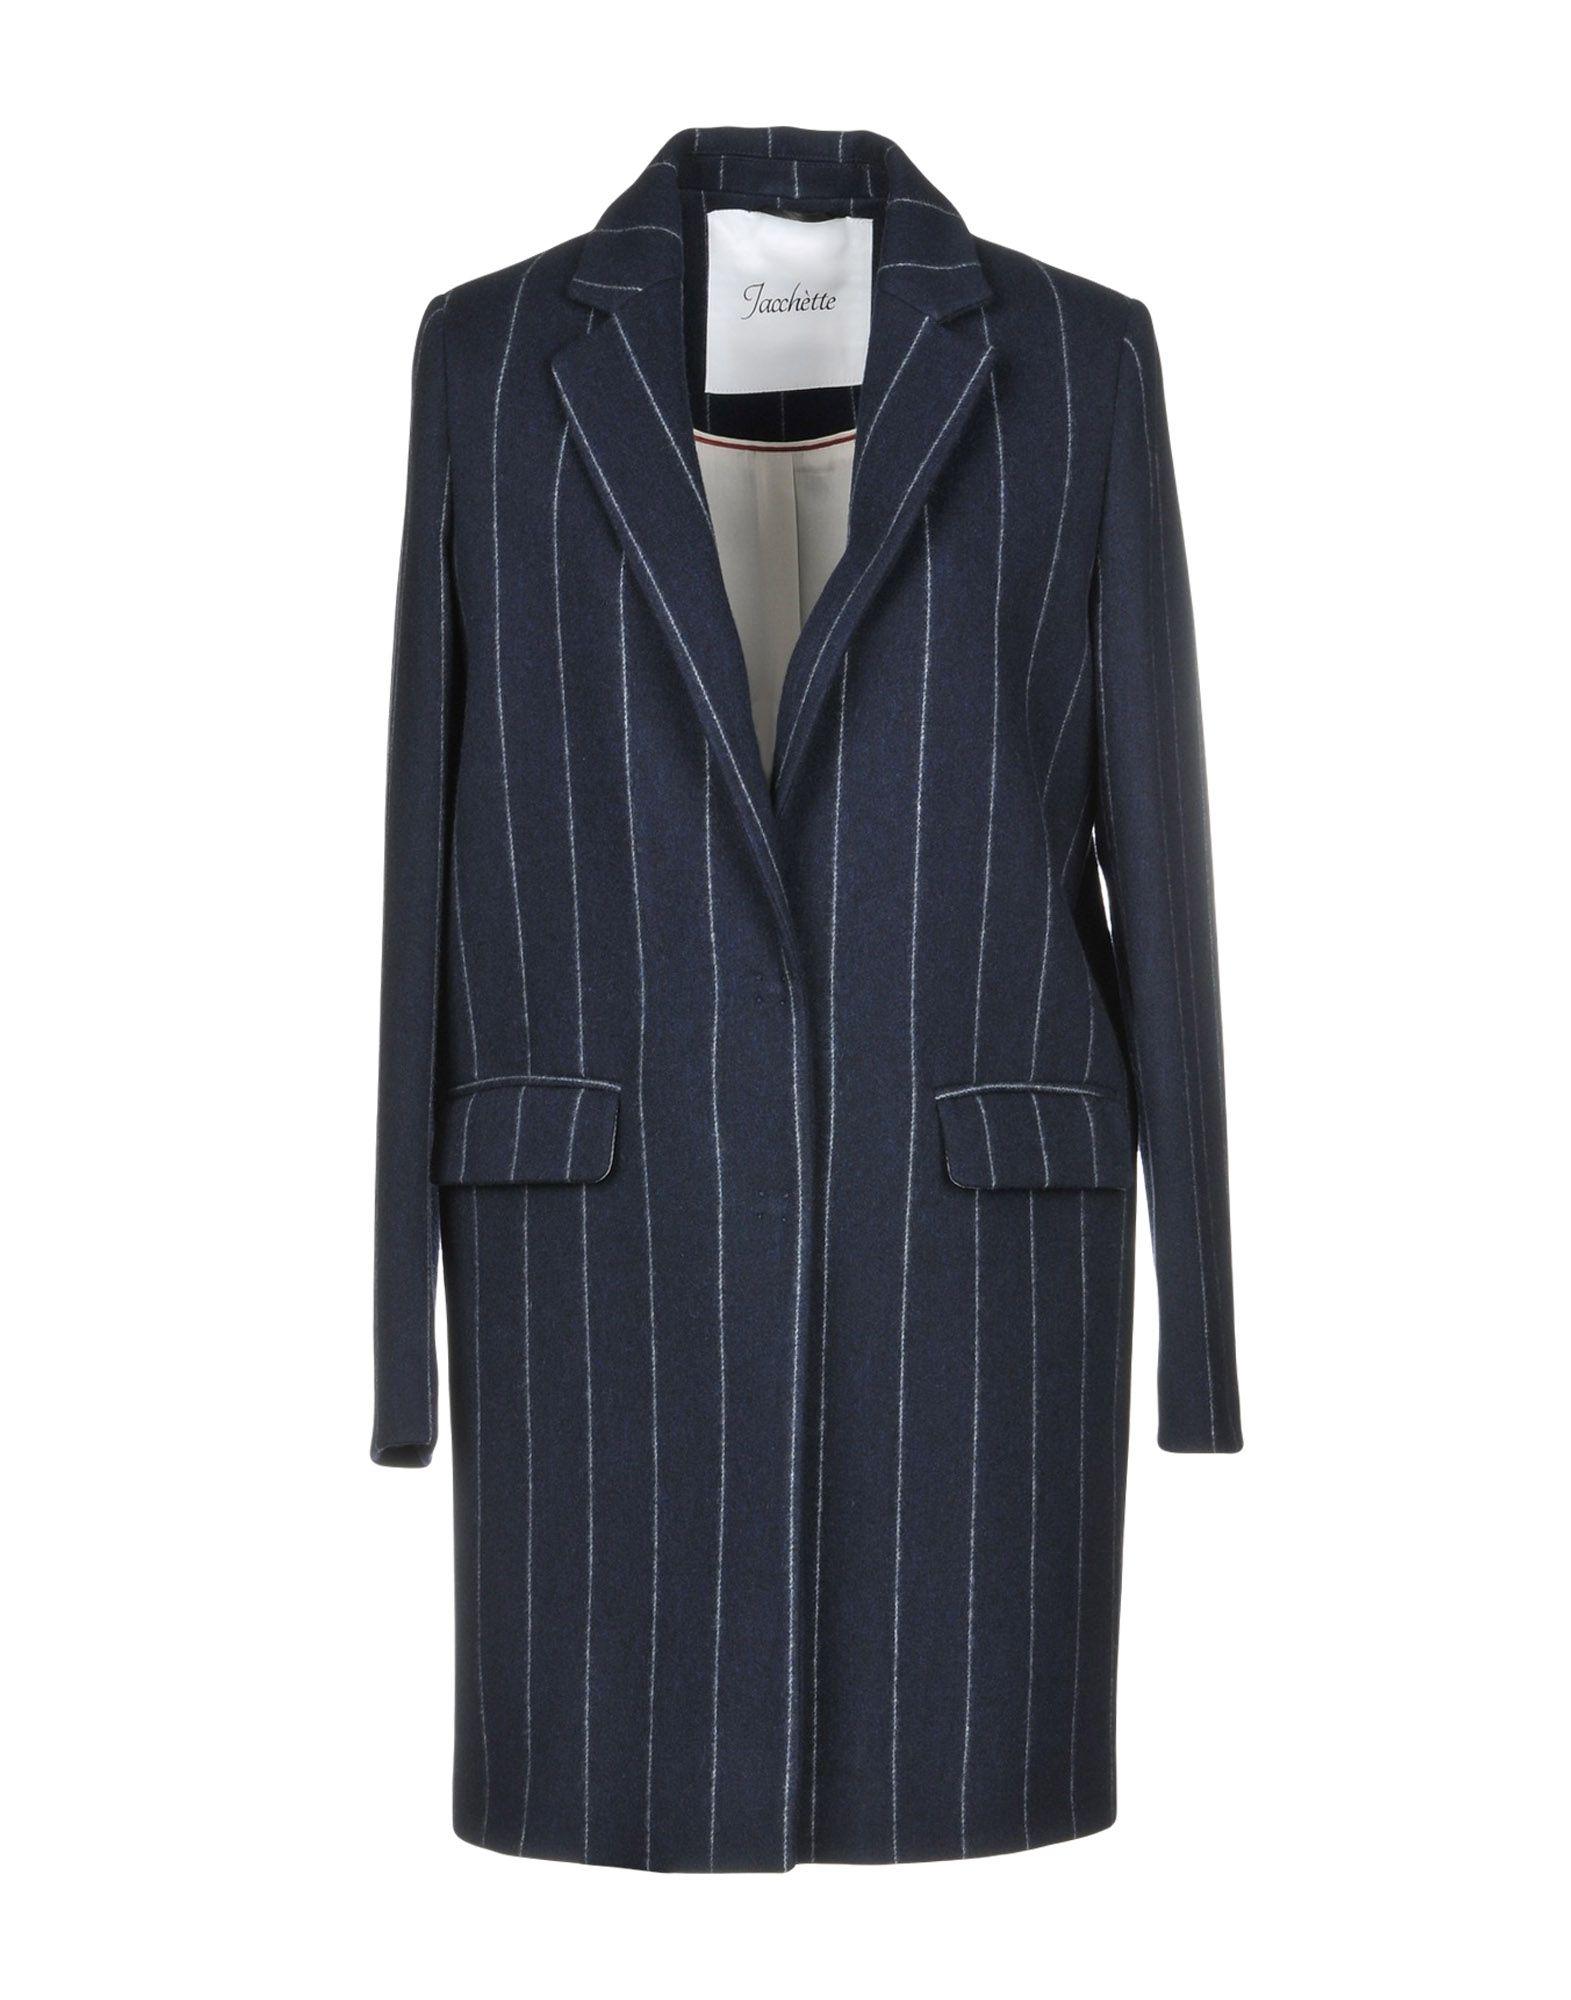 JACCHÈTTE Пальто 2016 осенью дамы сукно slim шерстяные пальто в длинные пальто